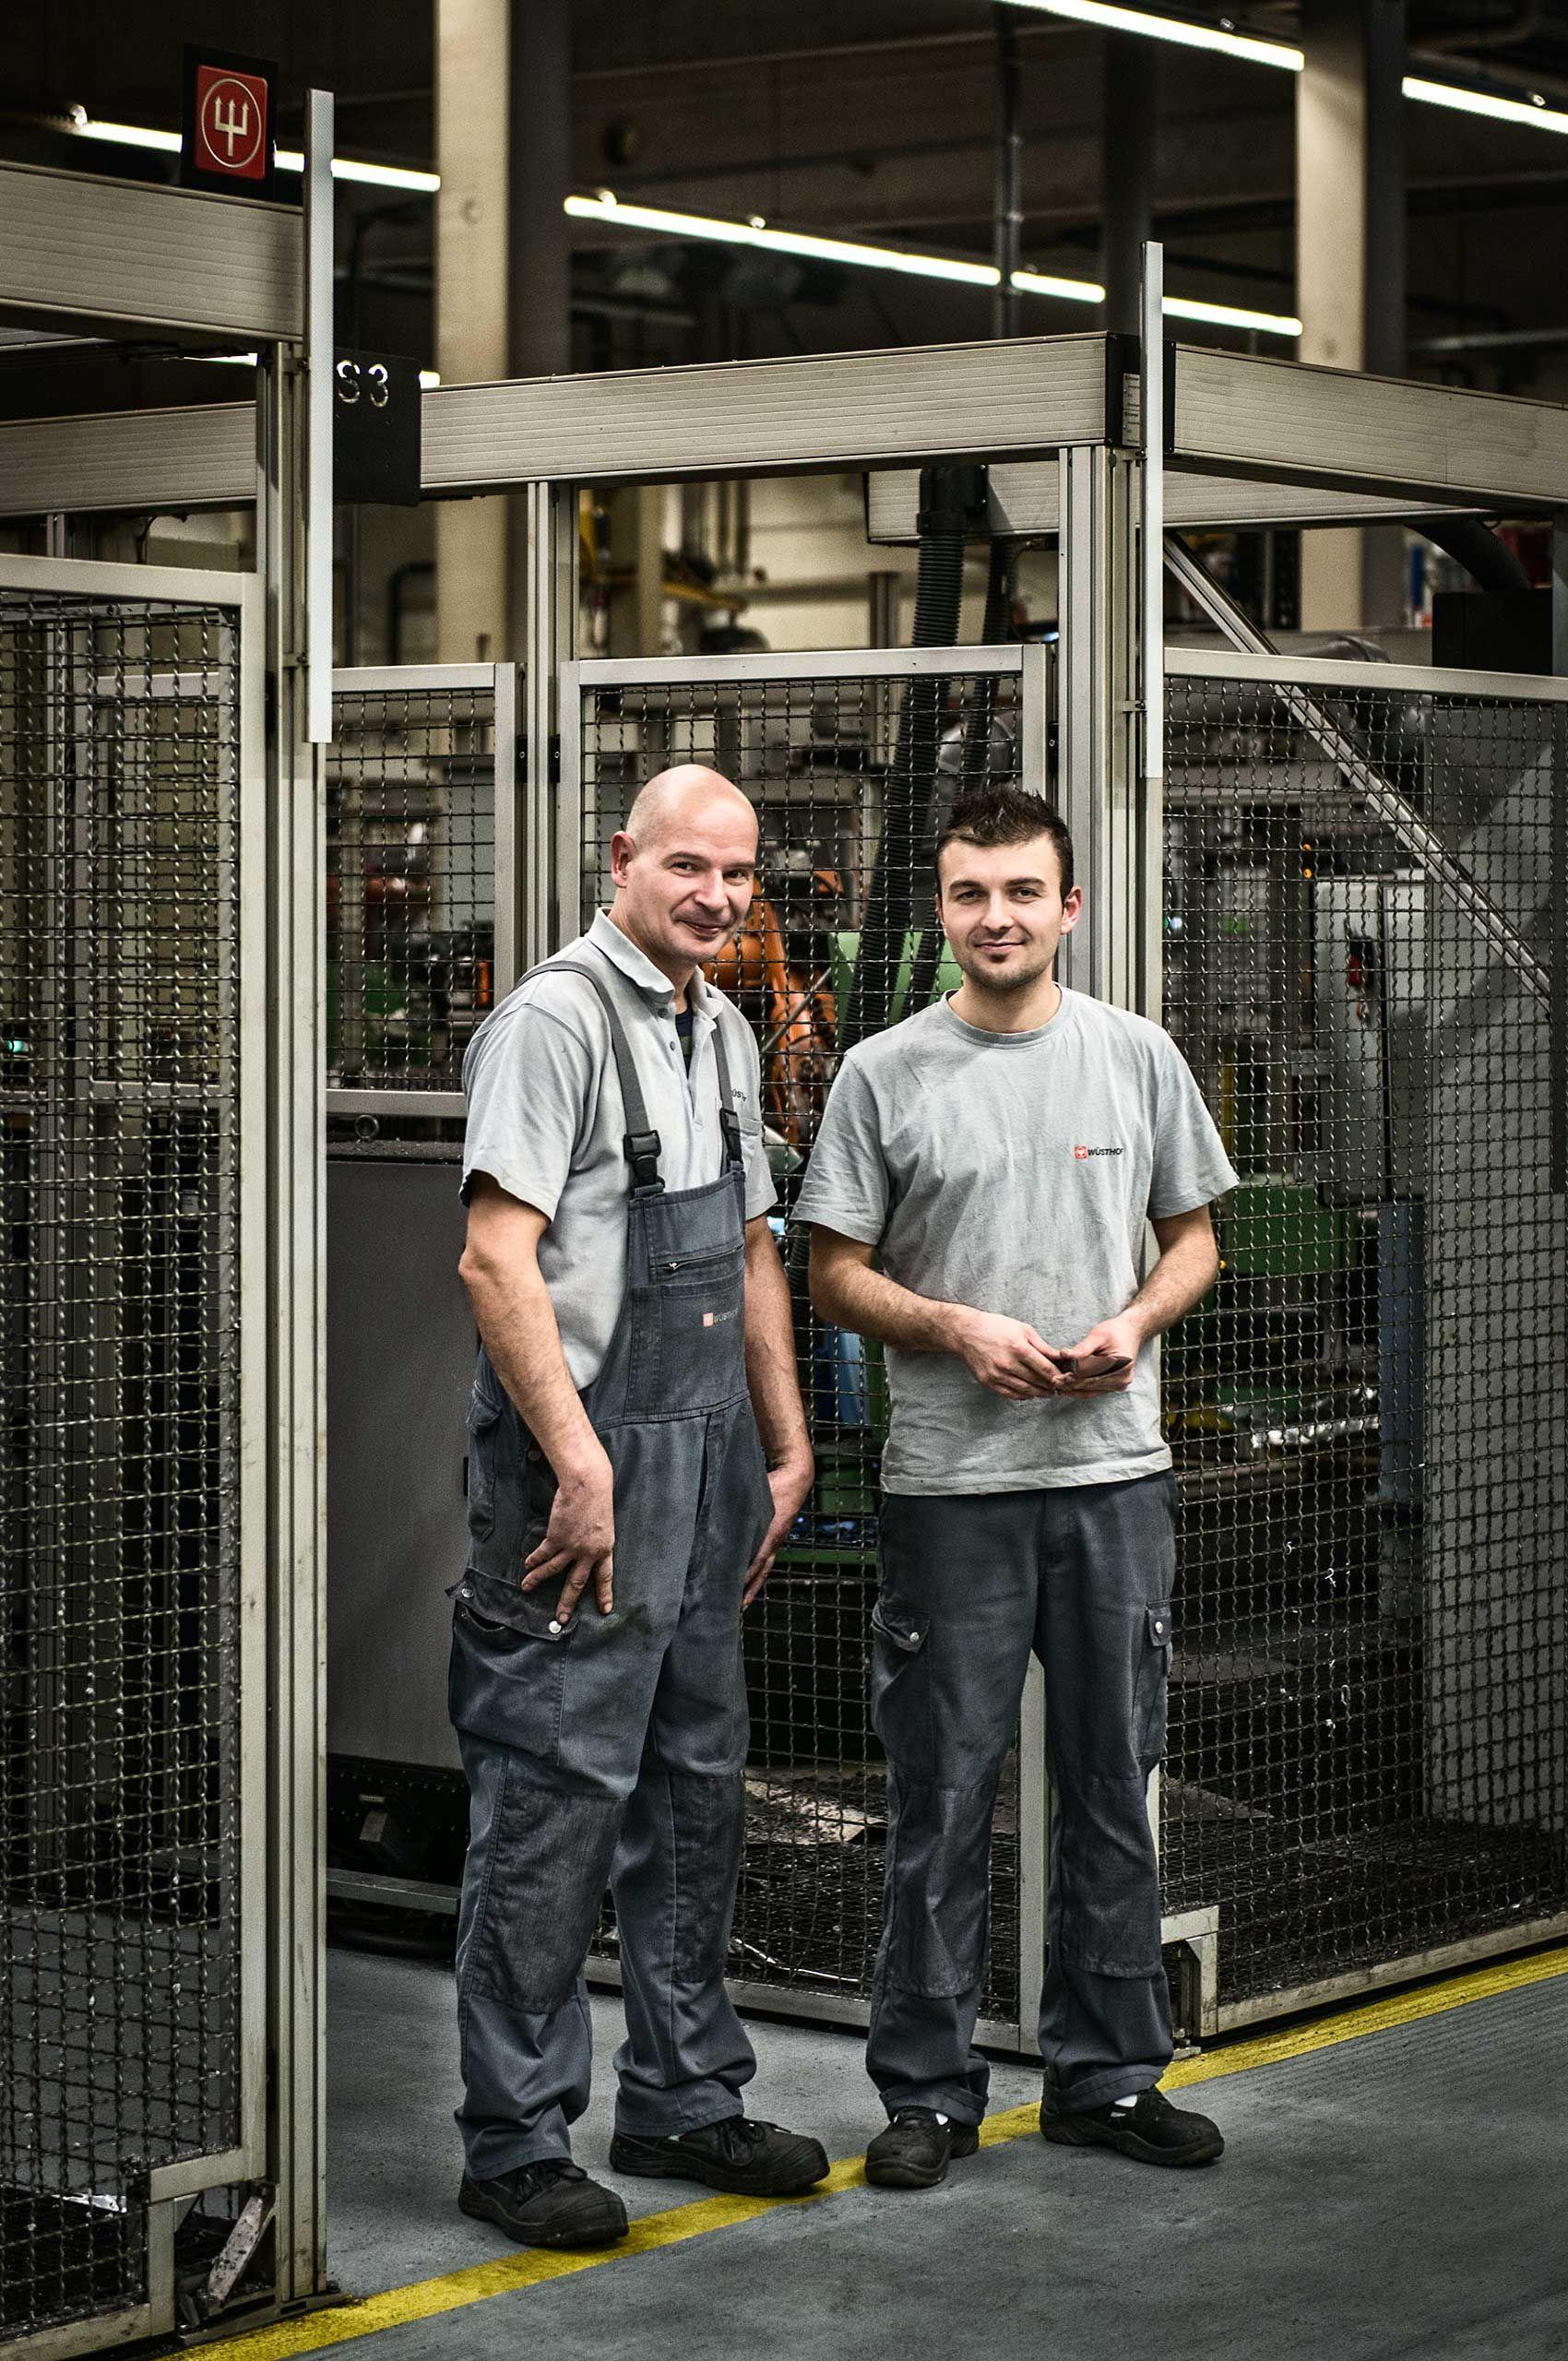 making-plans-wusthof-factory-HenrikOlundPhotography.jpg